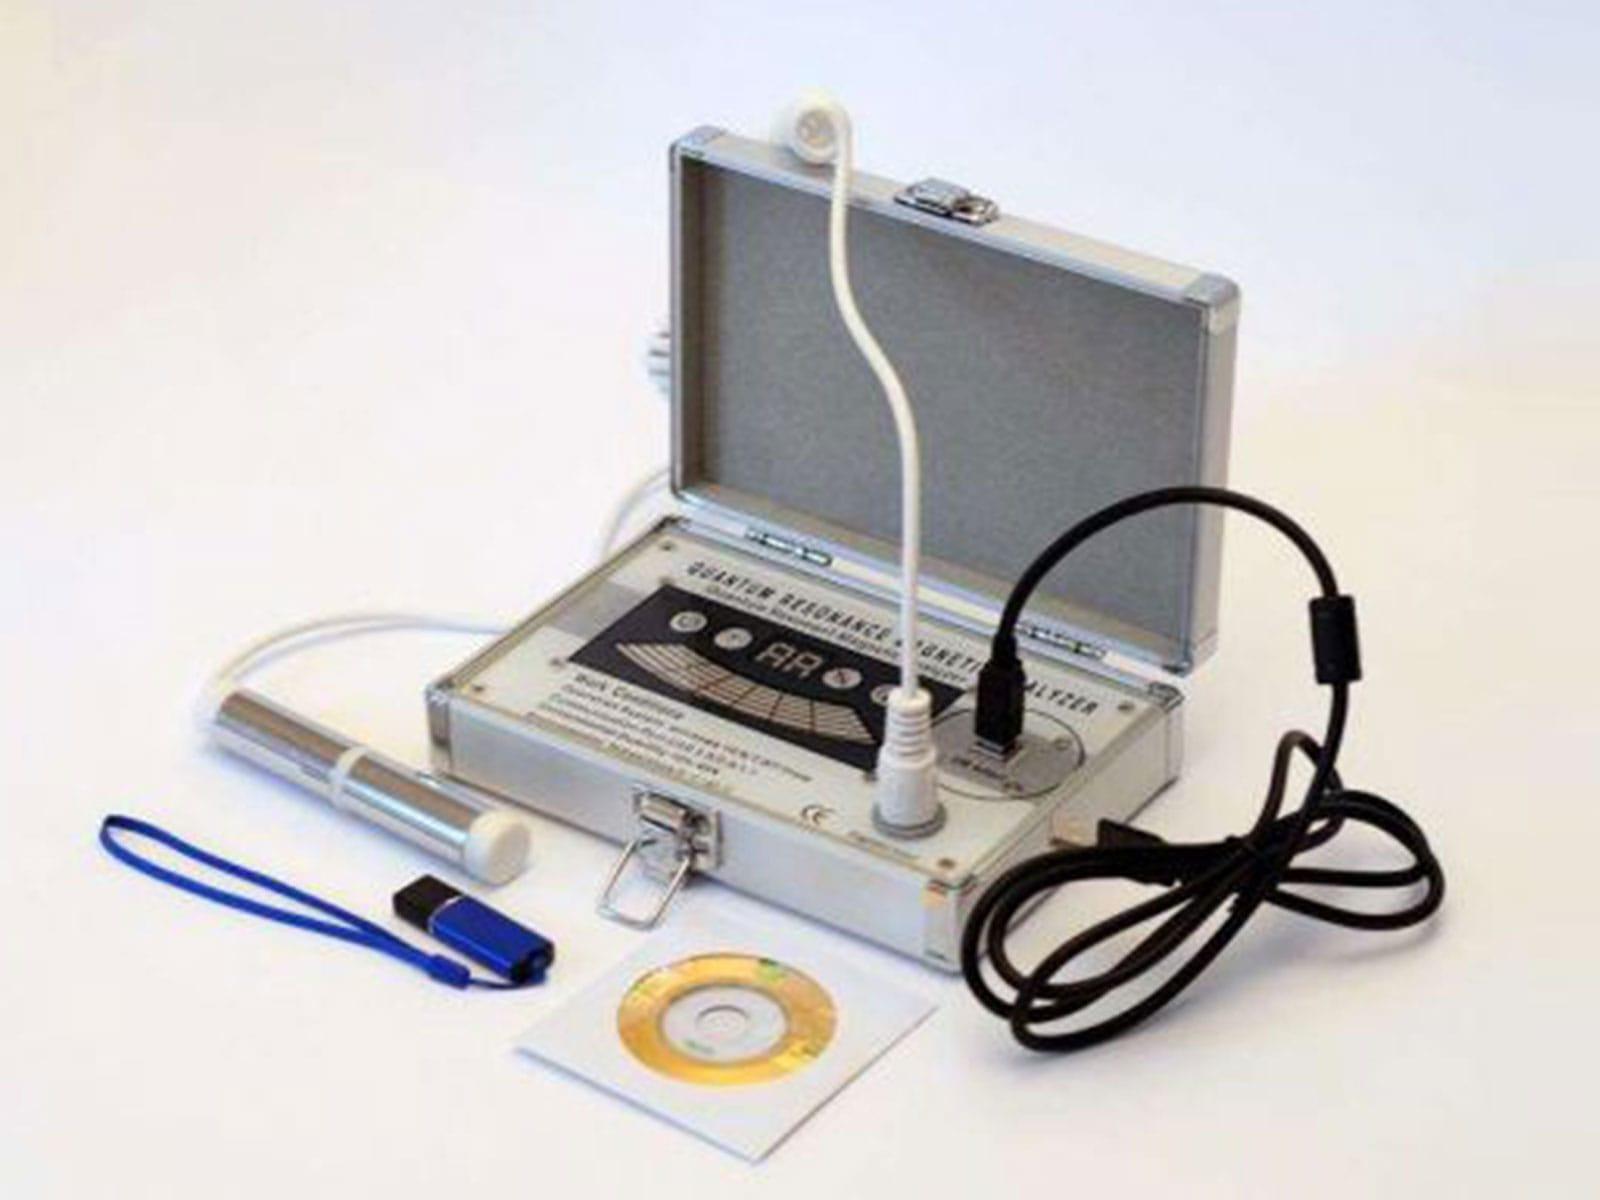 biorezonans-elektromagnetyczny-do-badania-golnego